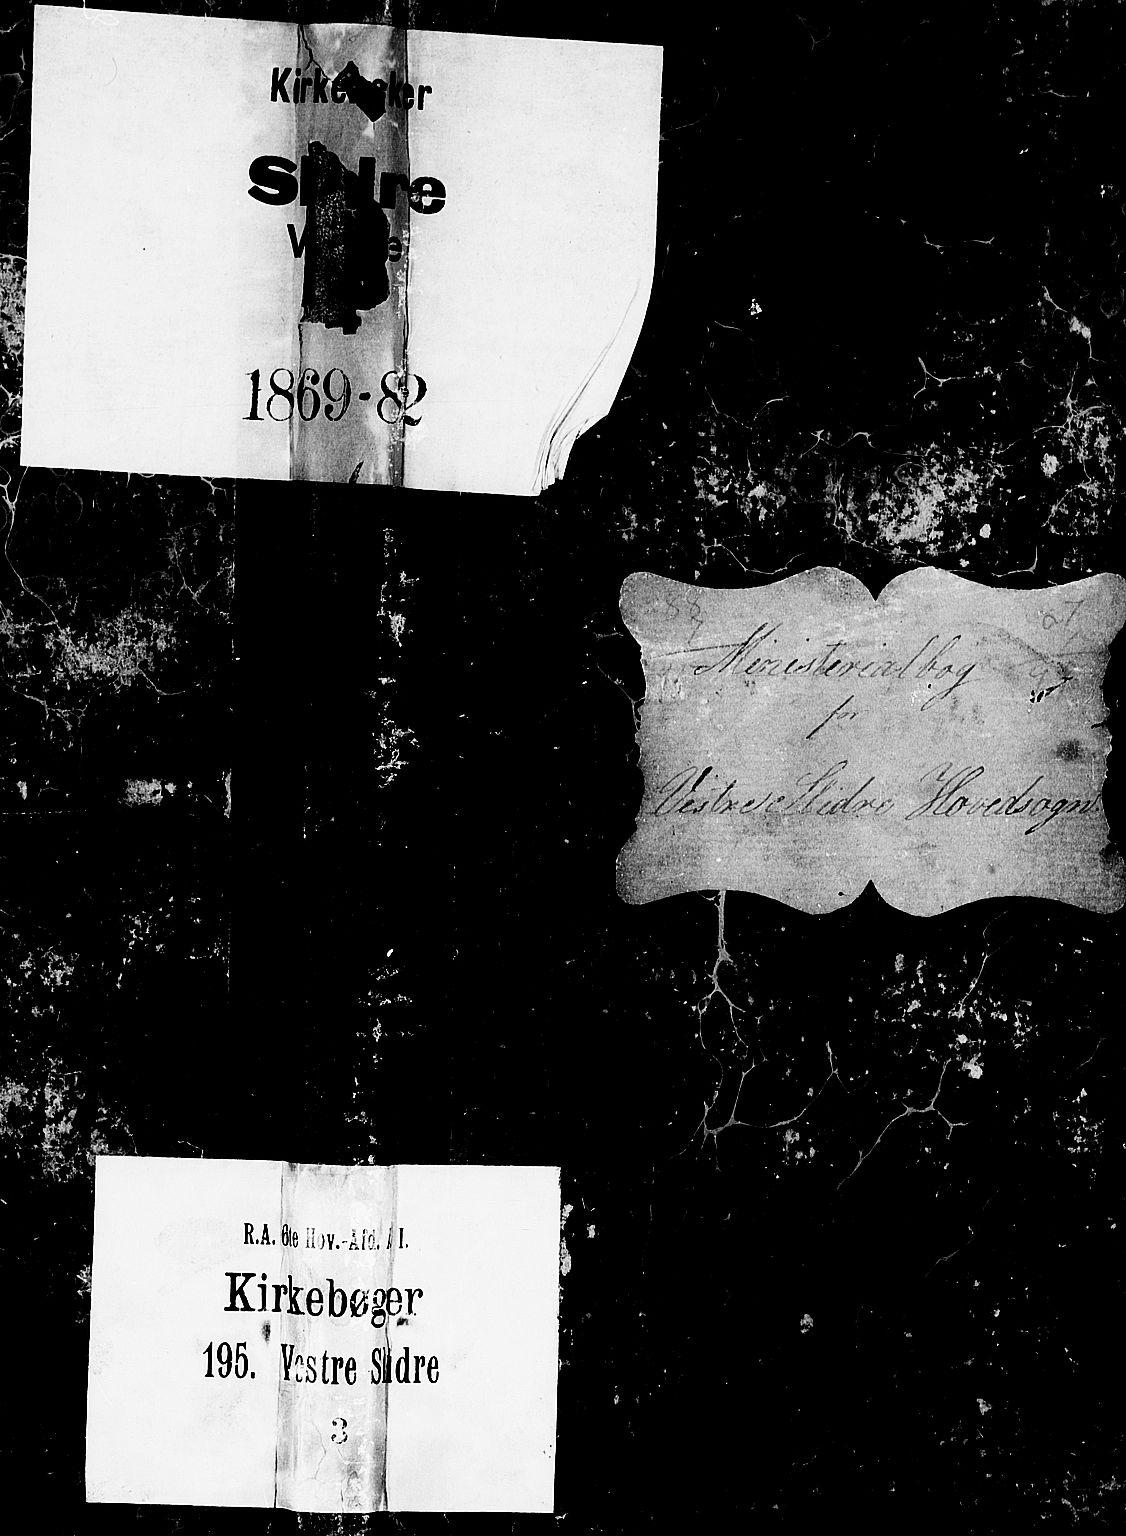 SAH, Vestre Slidre prestekontor, Klokkerbok nr. 1, 1869-1882